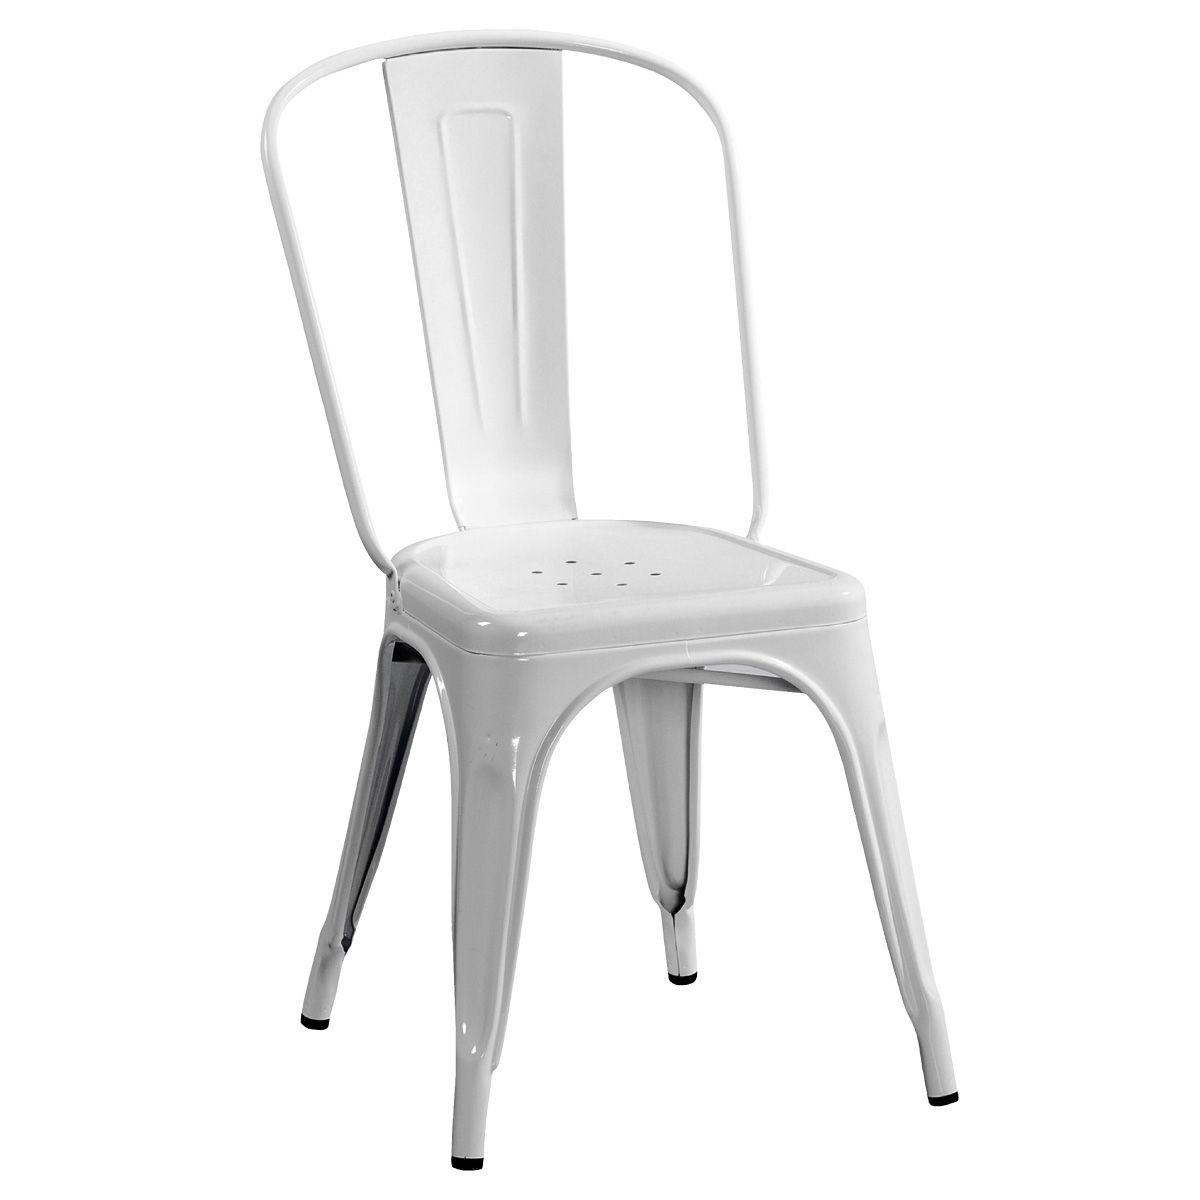 prix chaise tolix latest elegant chaise metal tolix stupefiant any chaise metal tolix prix. Black Bedroom Furniture Sets. Home Design Ideas